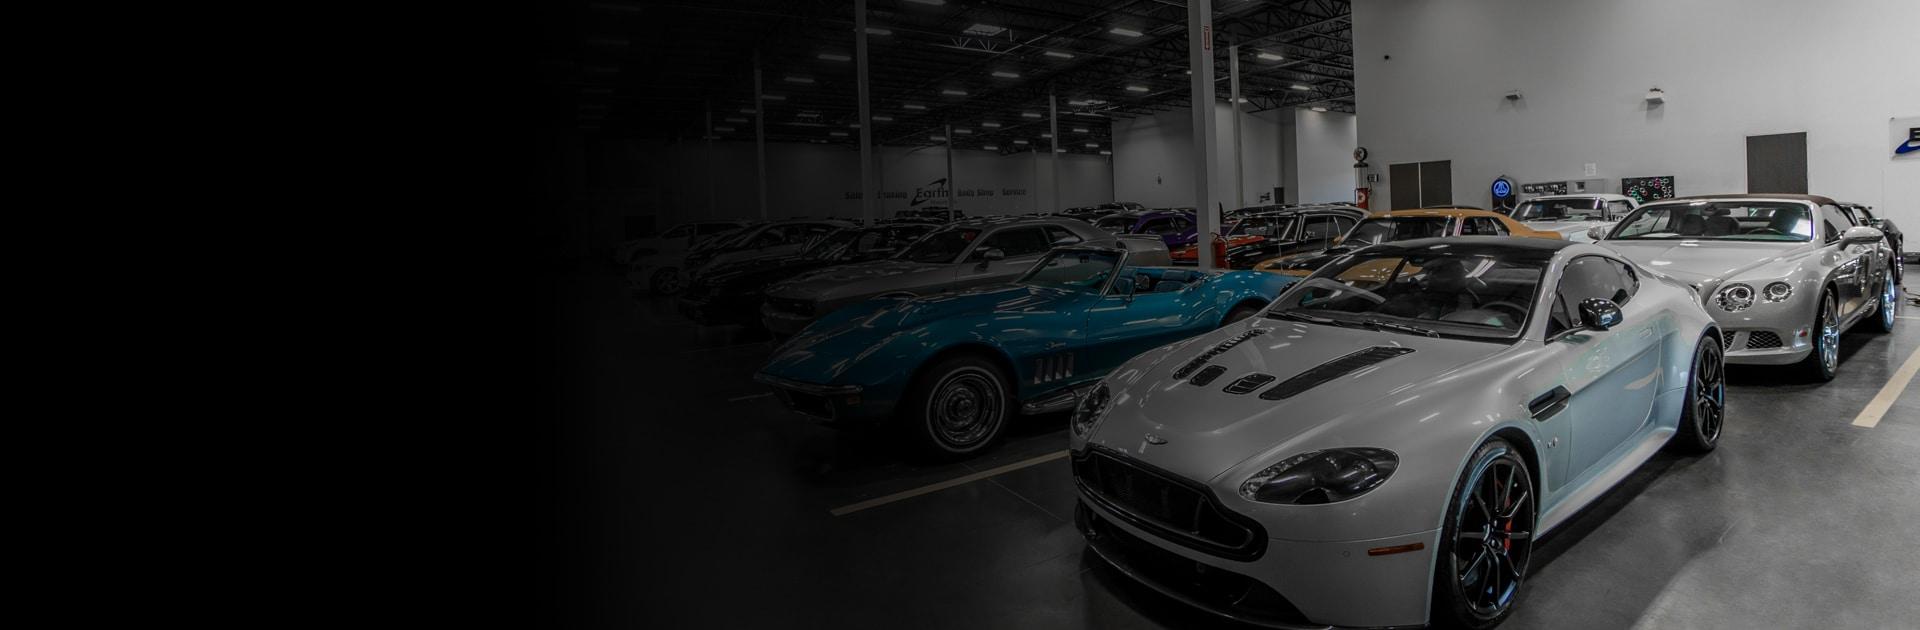 Earth MotorCars | Used Dealership in Carrollton, TX